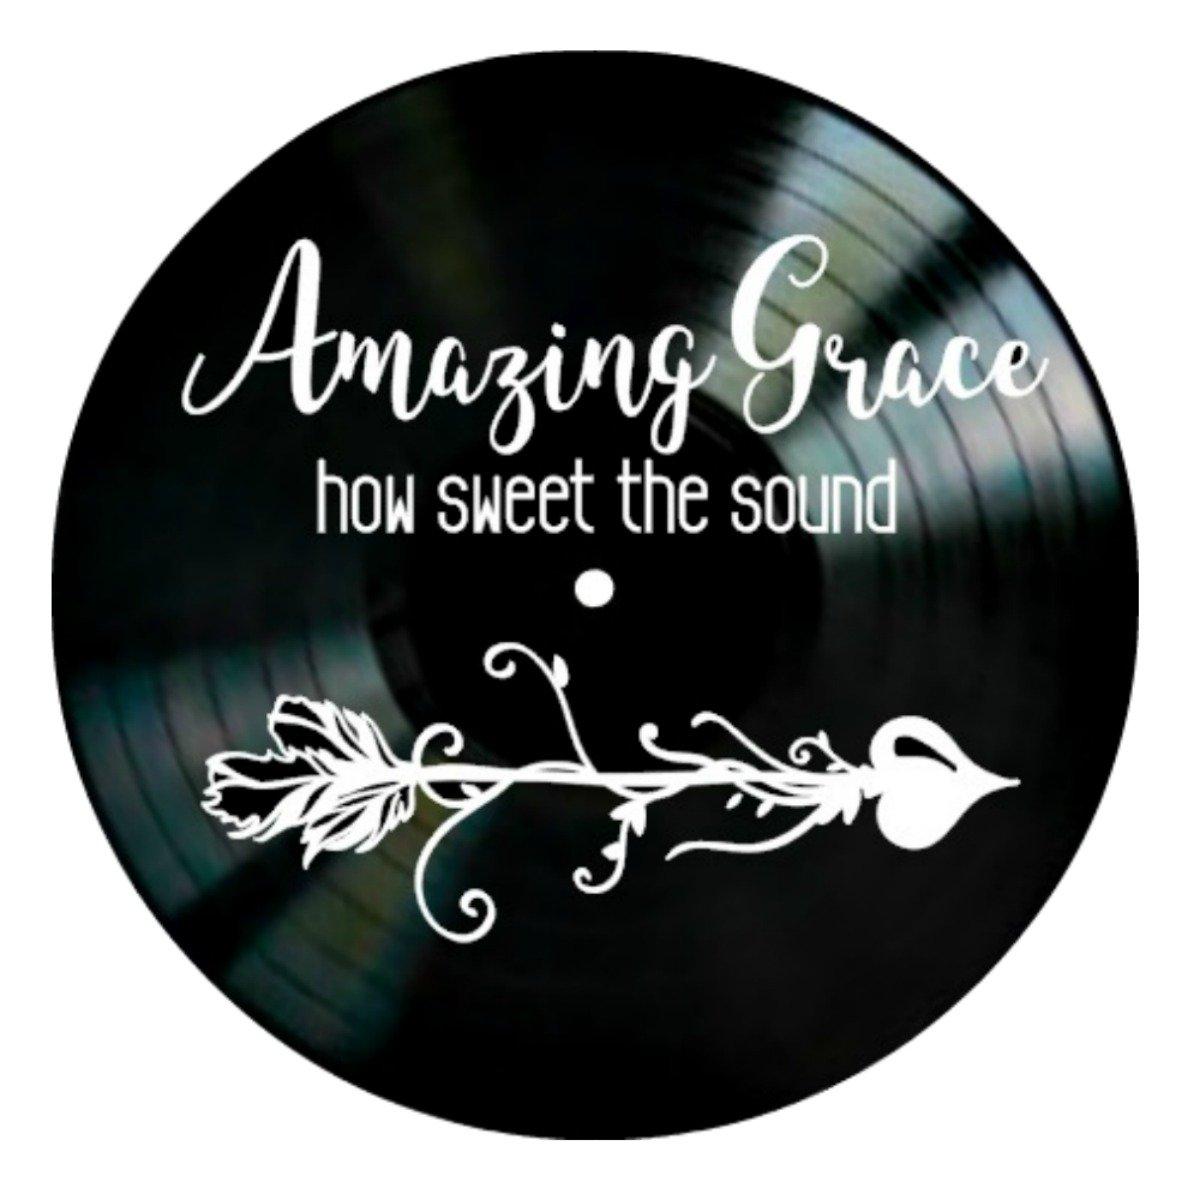 Amazing Grace Christian song lyrics on a Vinyl Record Wall Decor